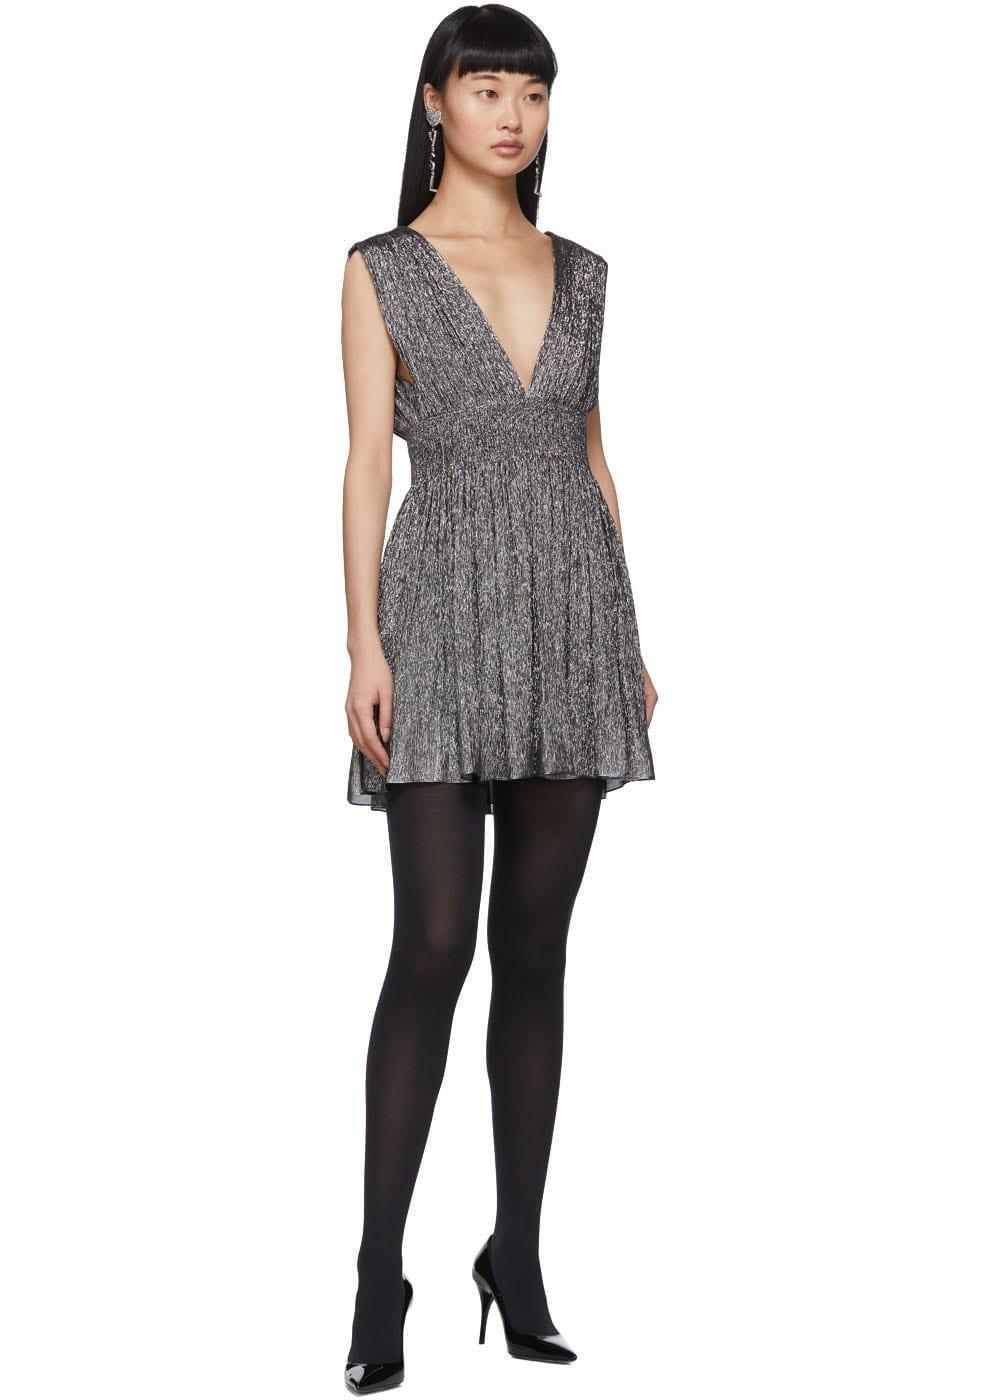 SAINT LAURENT Silver Lurex Short Dress